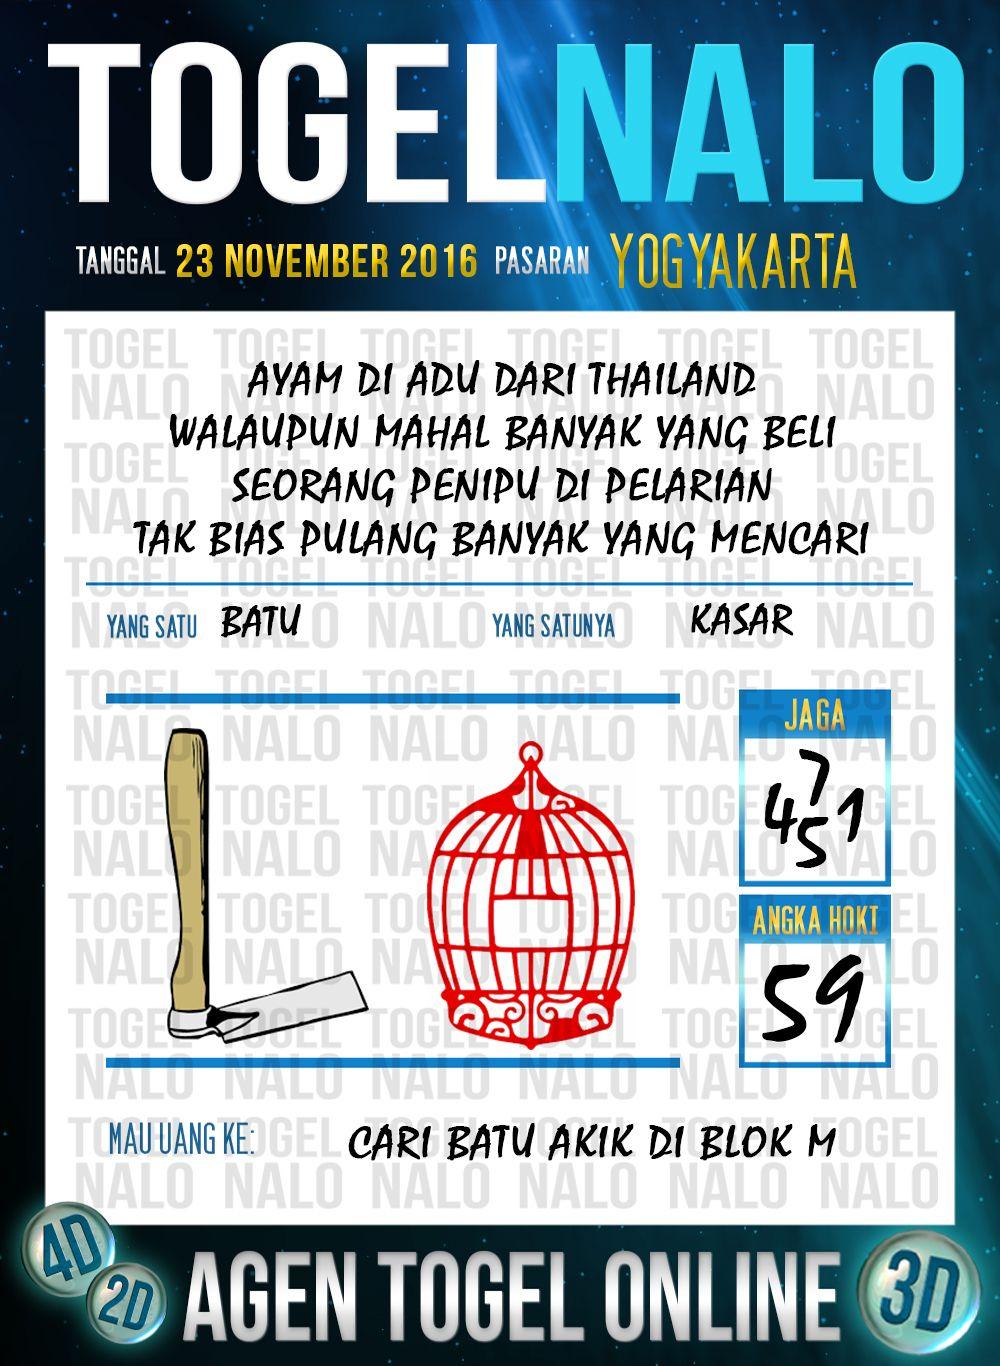 Kode Jp 2d Togel Wap Online Live Draw 4d Togelnalo Yogyakarta 23 November 2016 November 8 Januari Yogyakarta